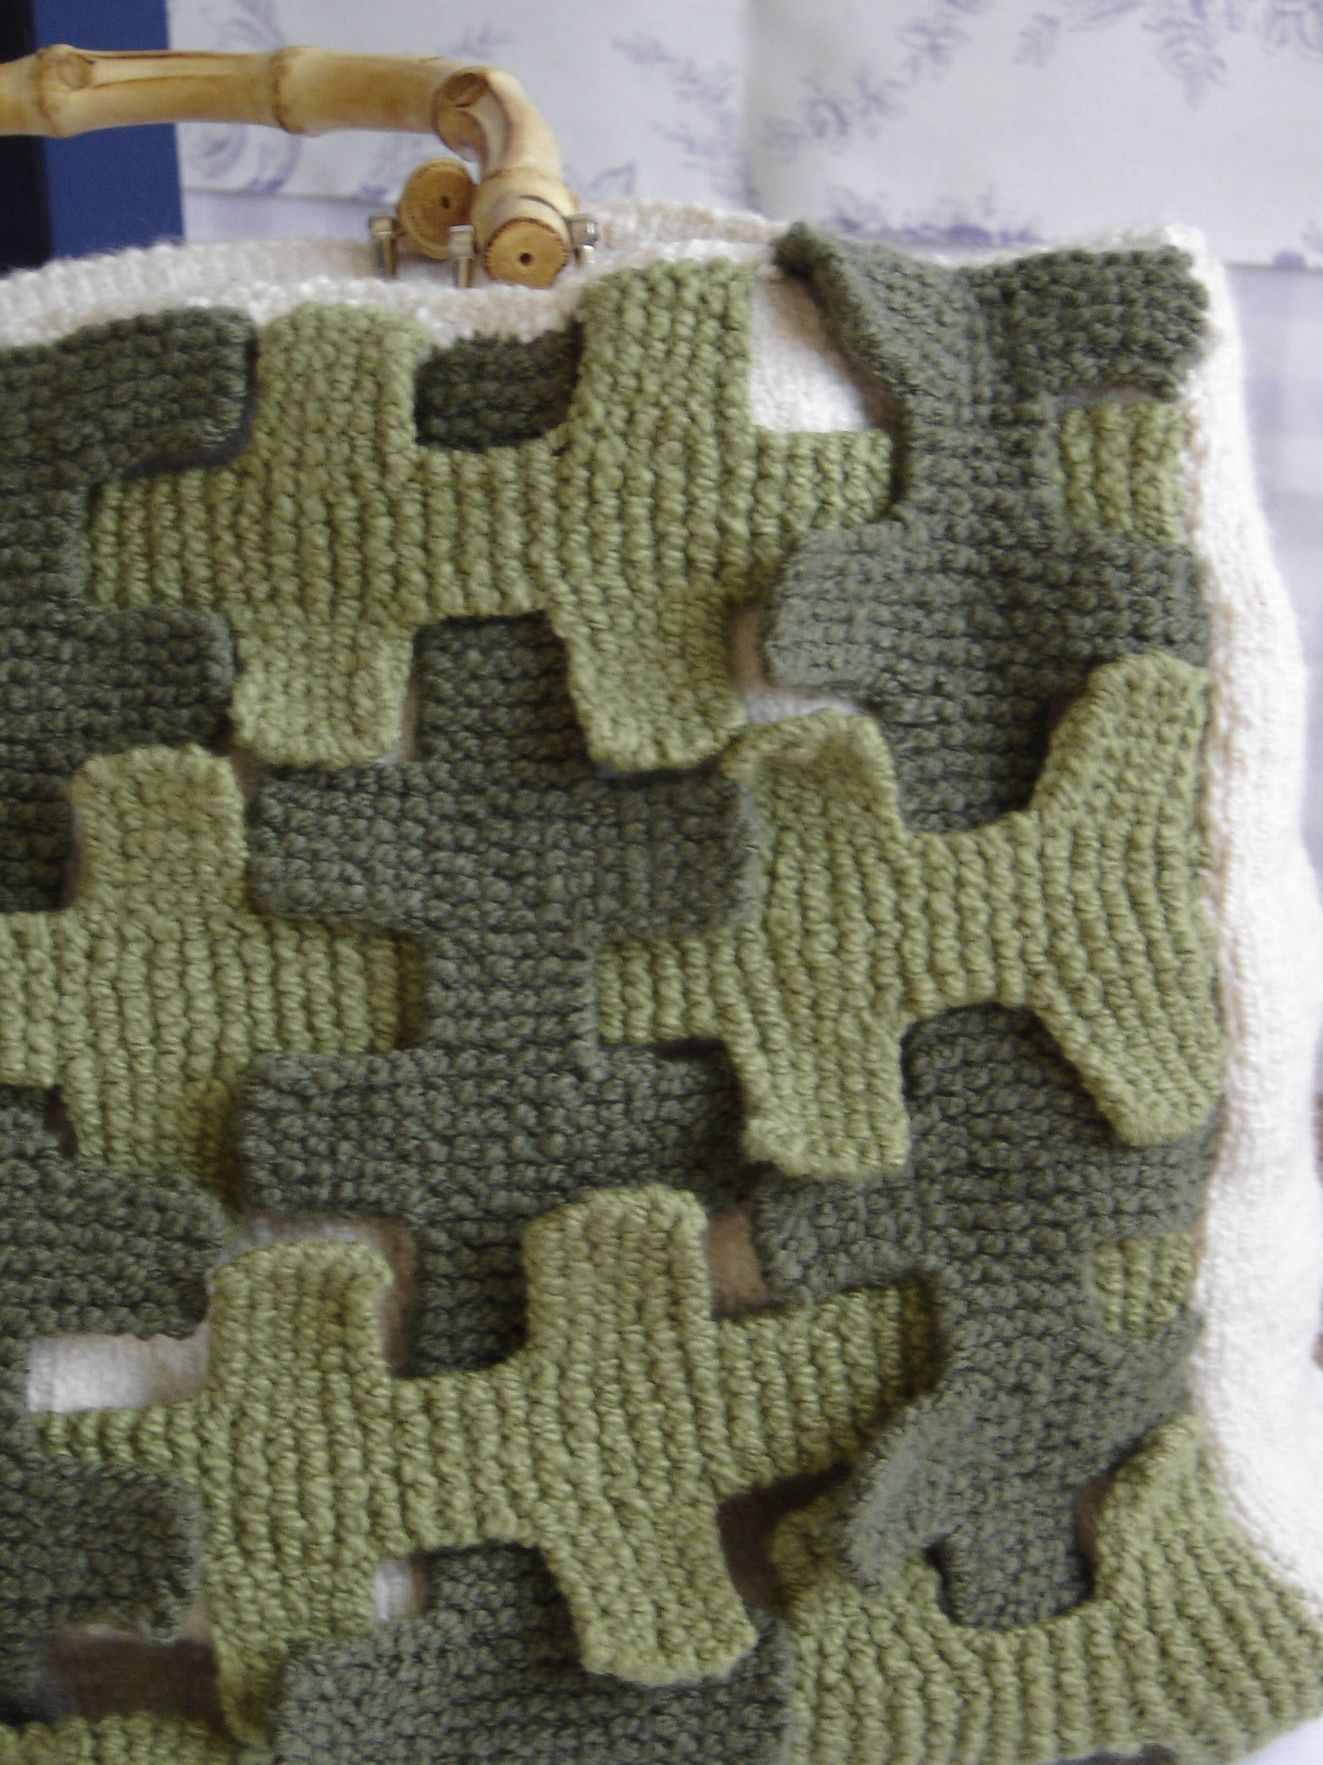 Interlaced garter stitch strips - maddy laine Knitting Patterns ...